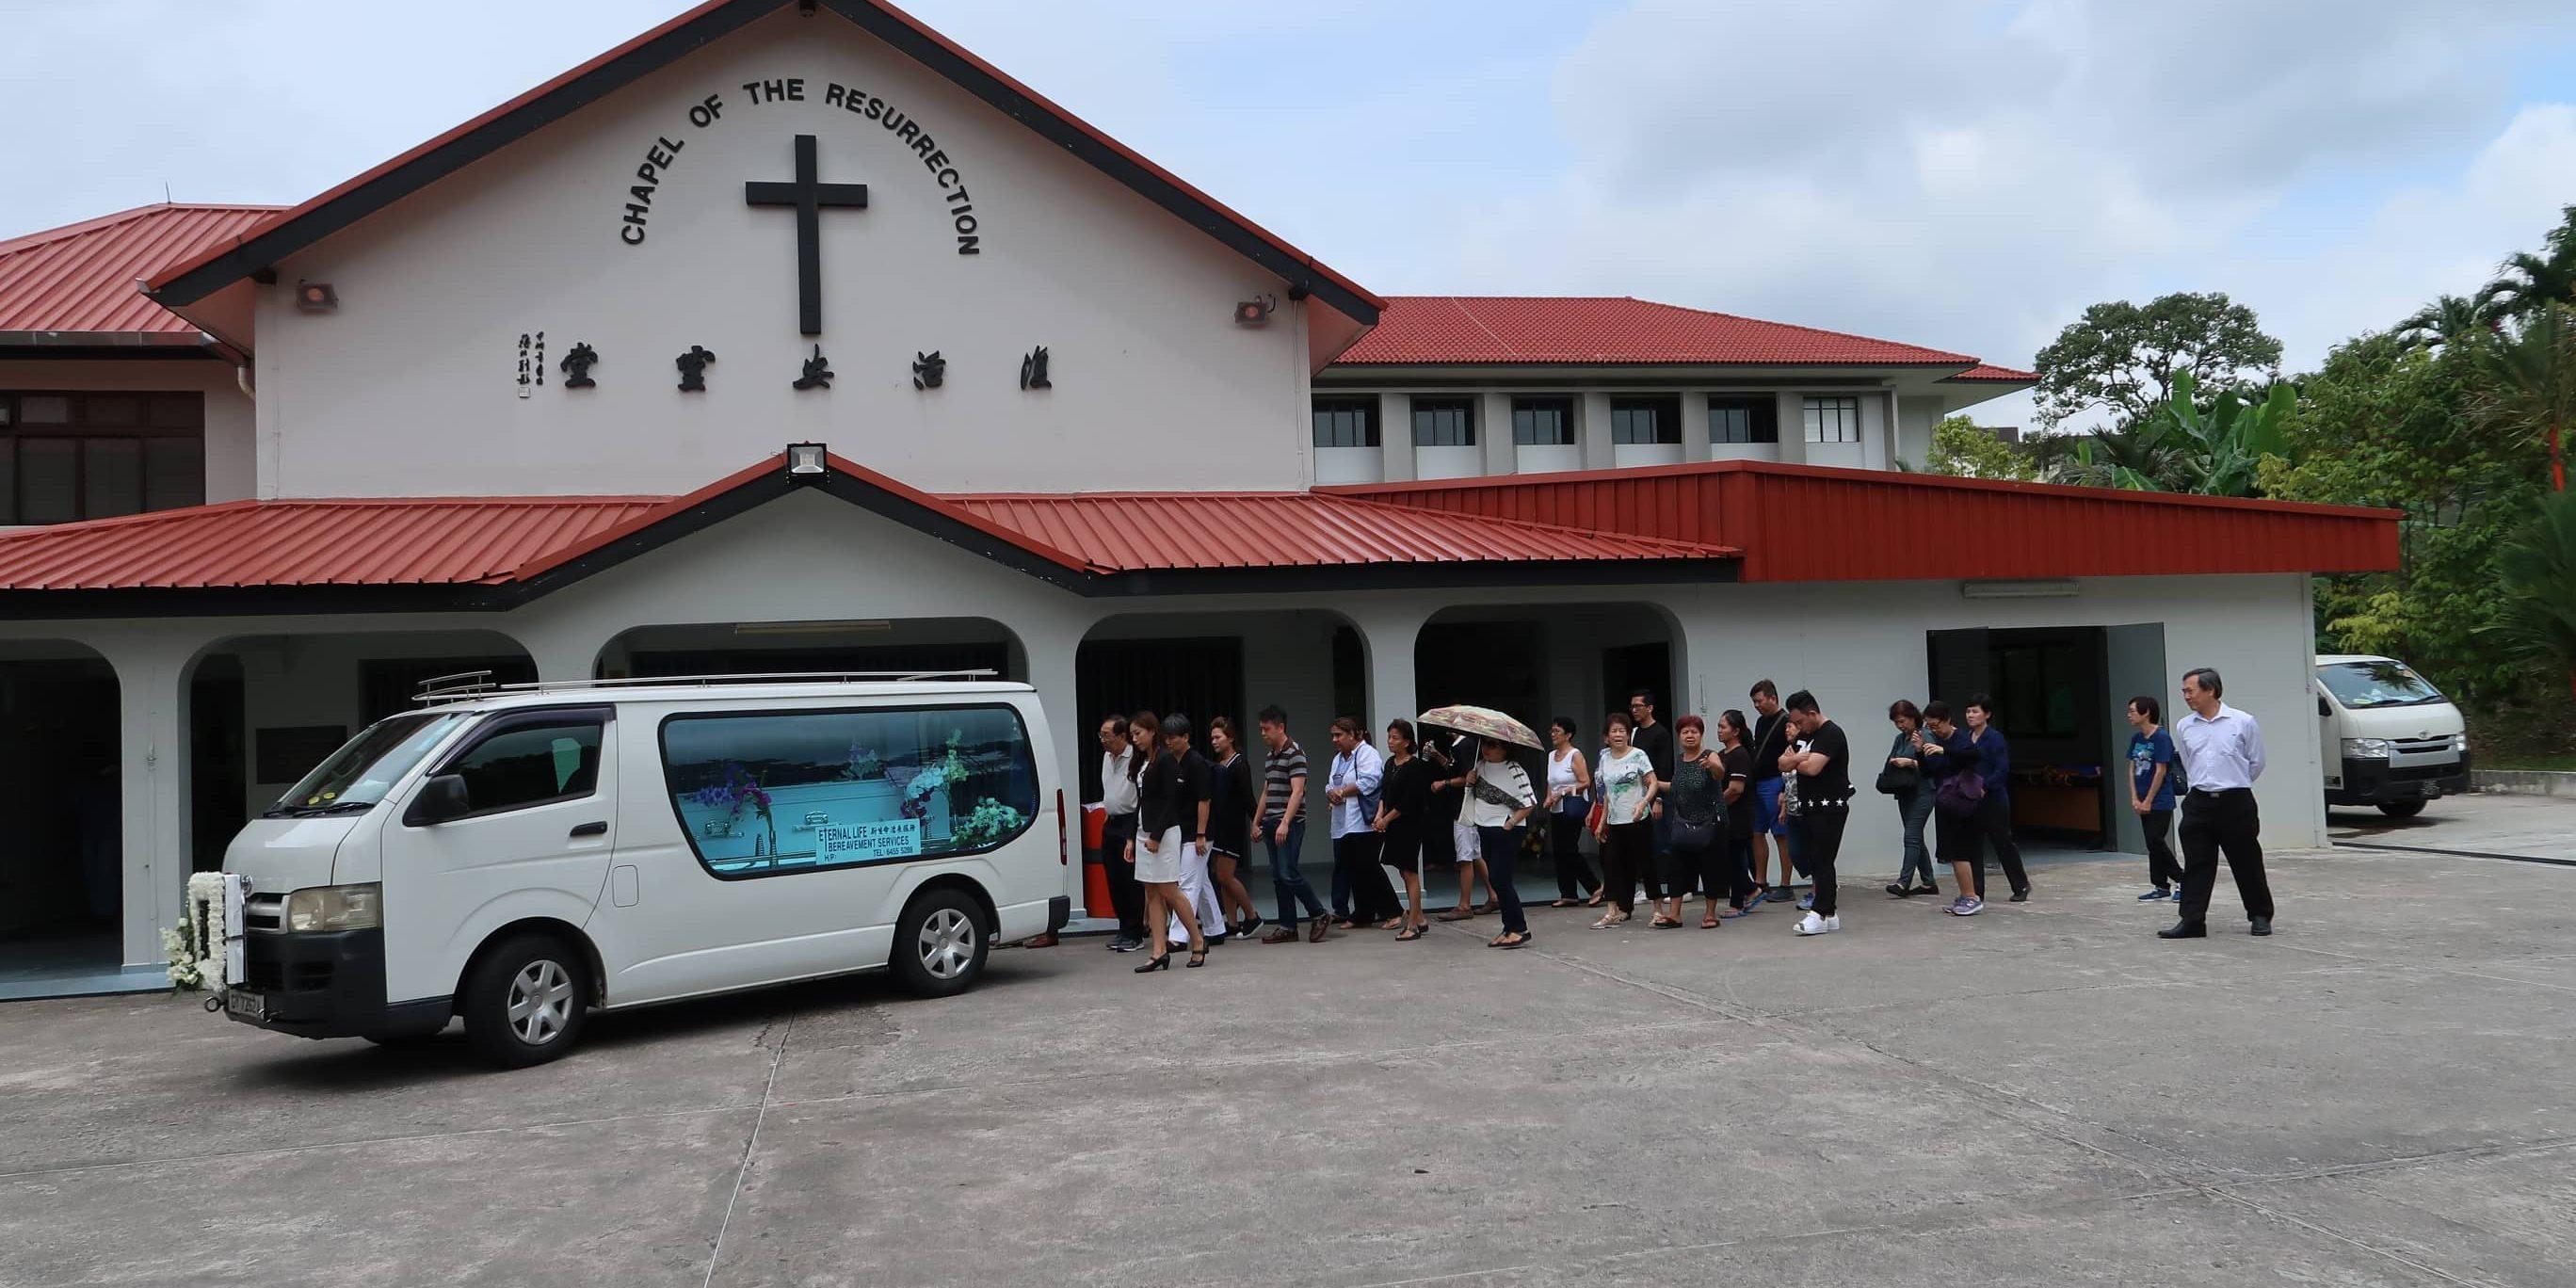 IMG 0247 1 panorama - Singapore Catholic Funeral Services